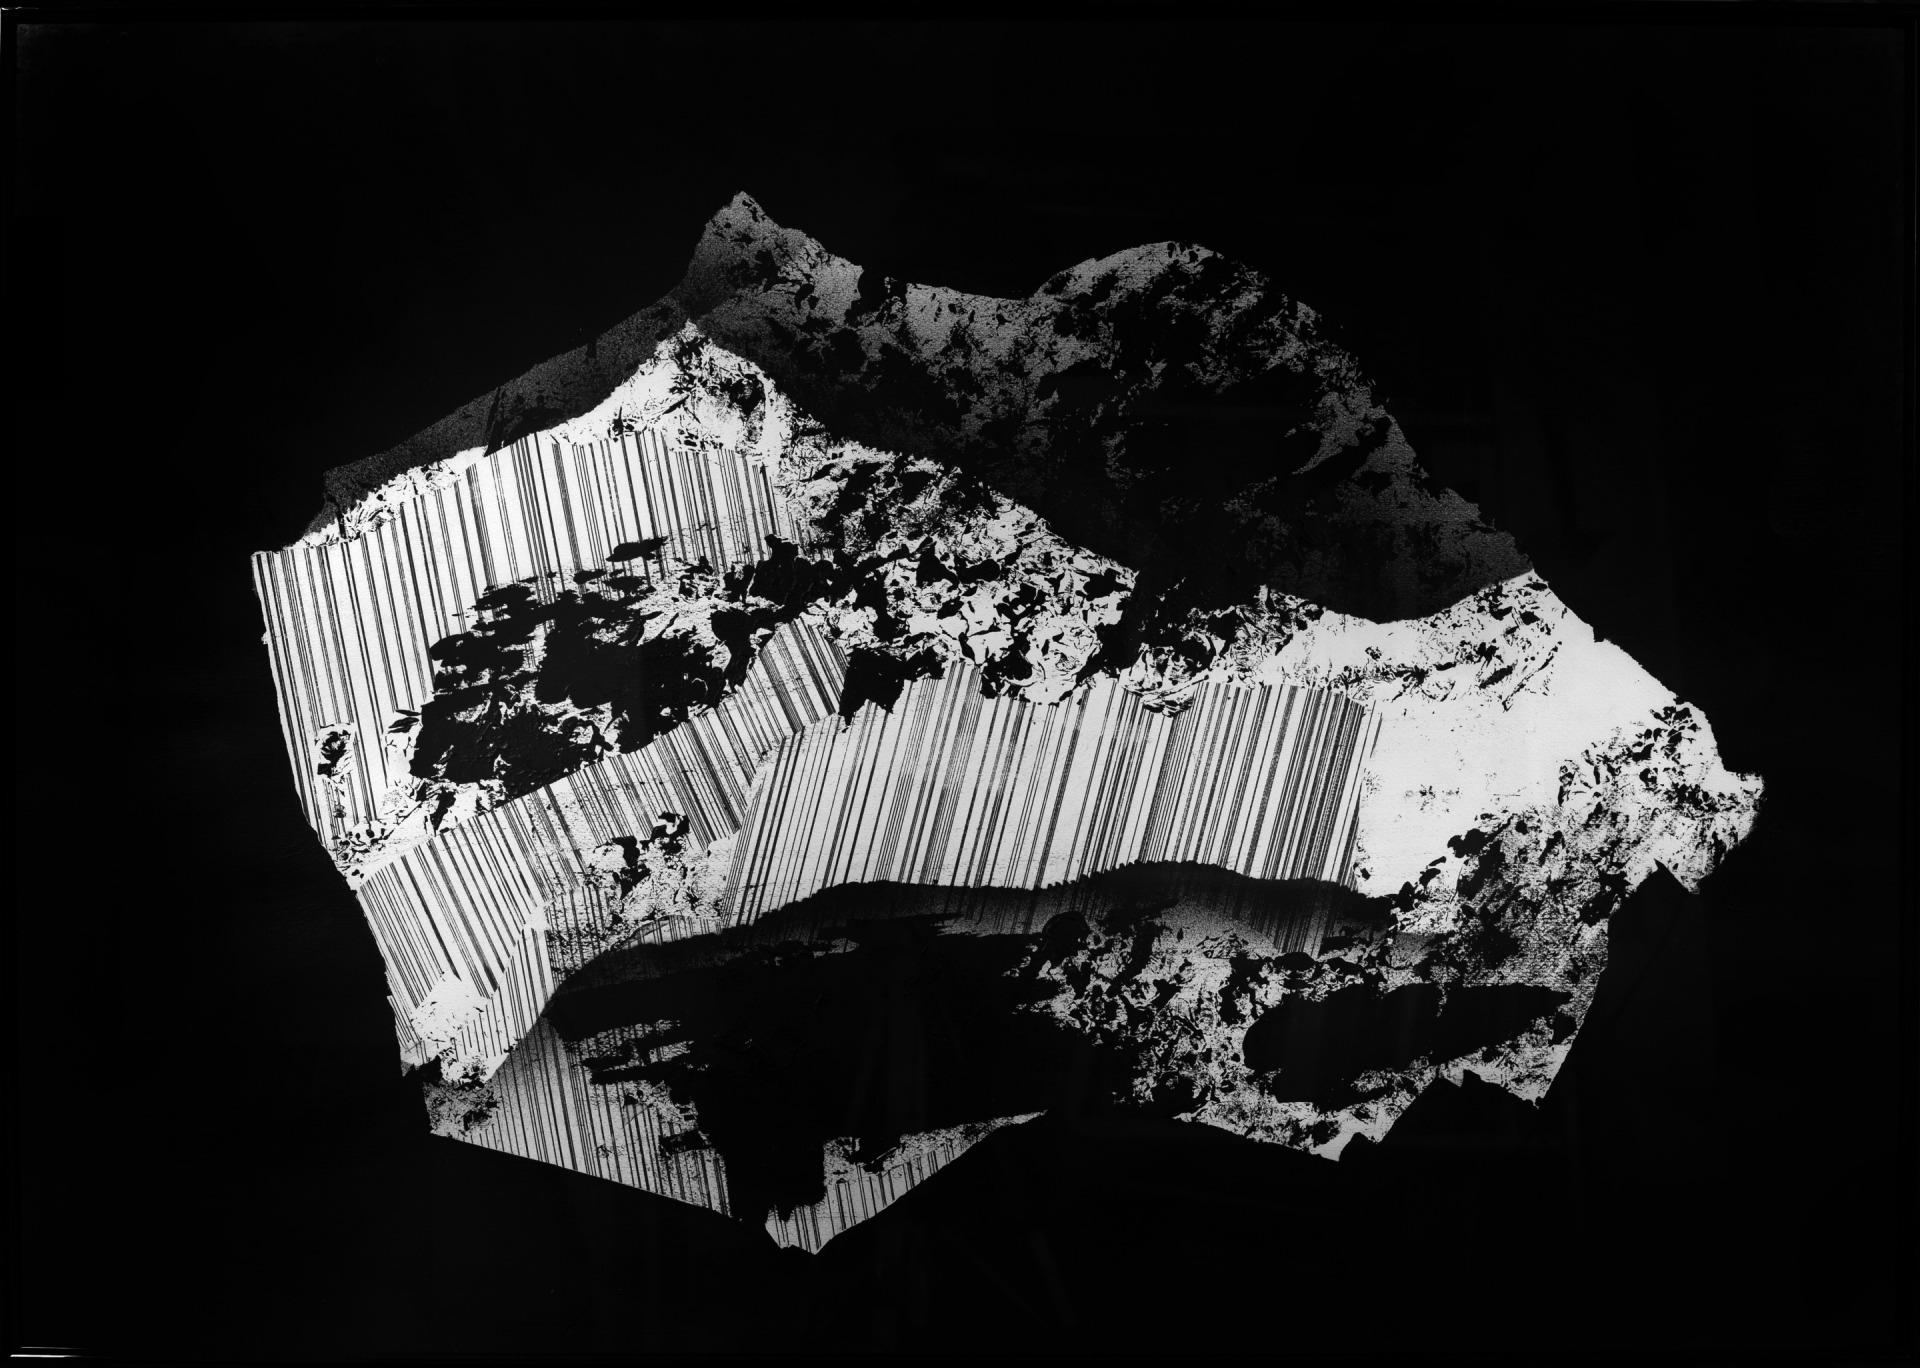 Contemporary art from Gyula Sági | op070321. 10